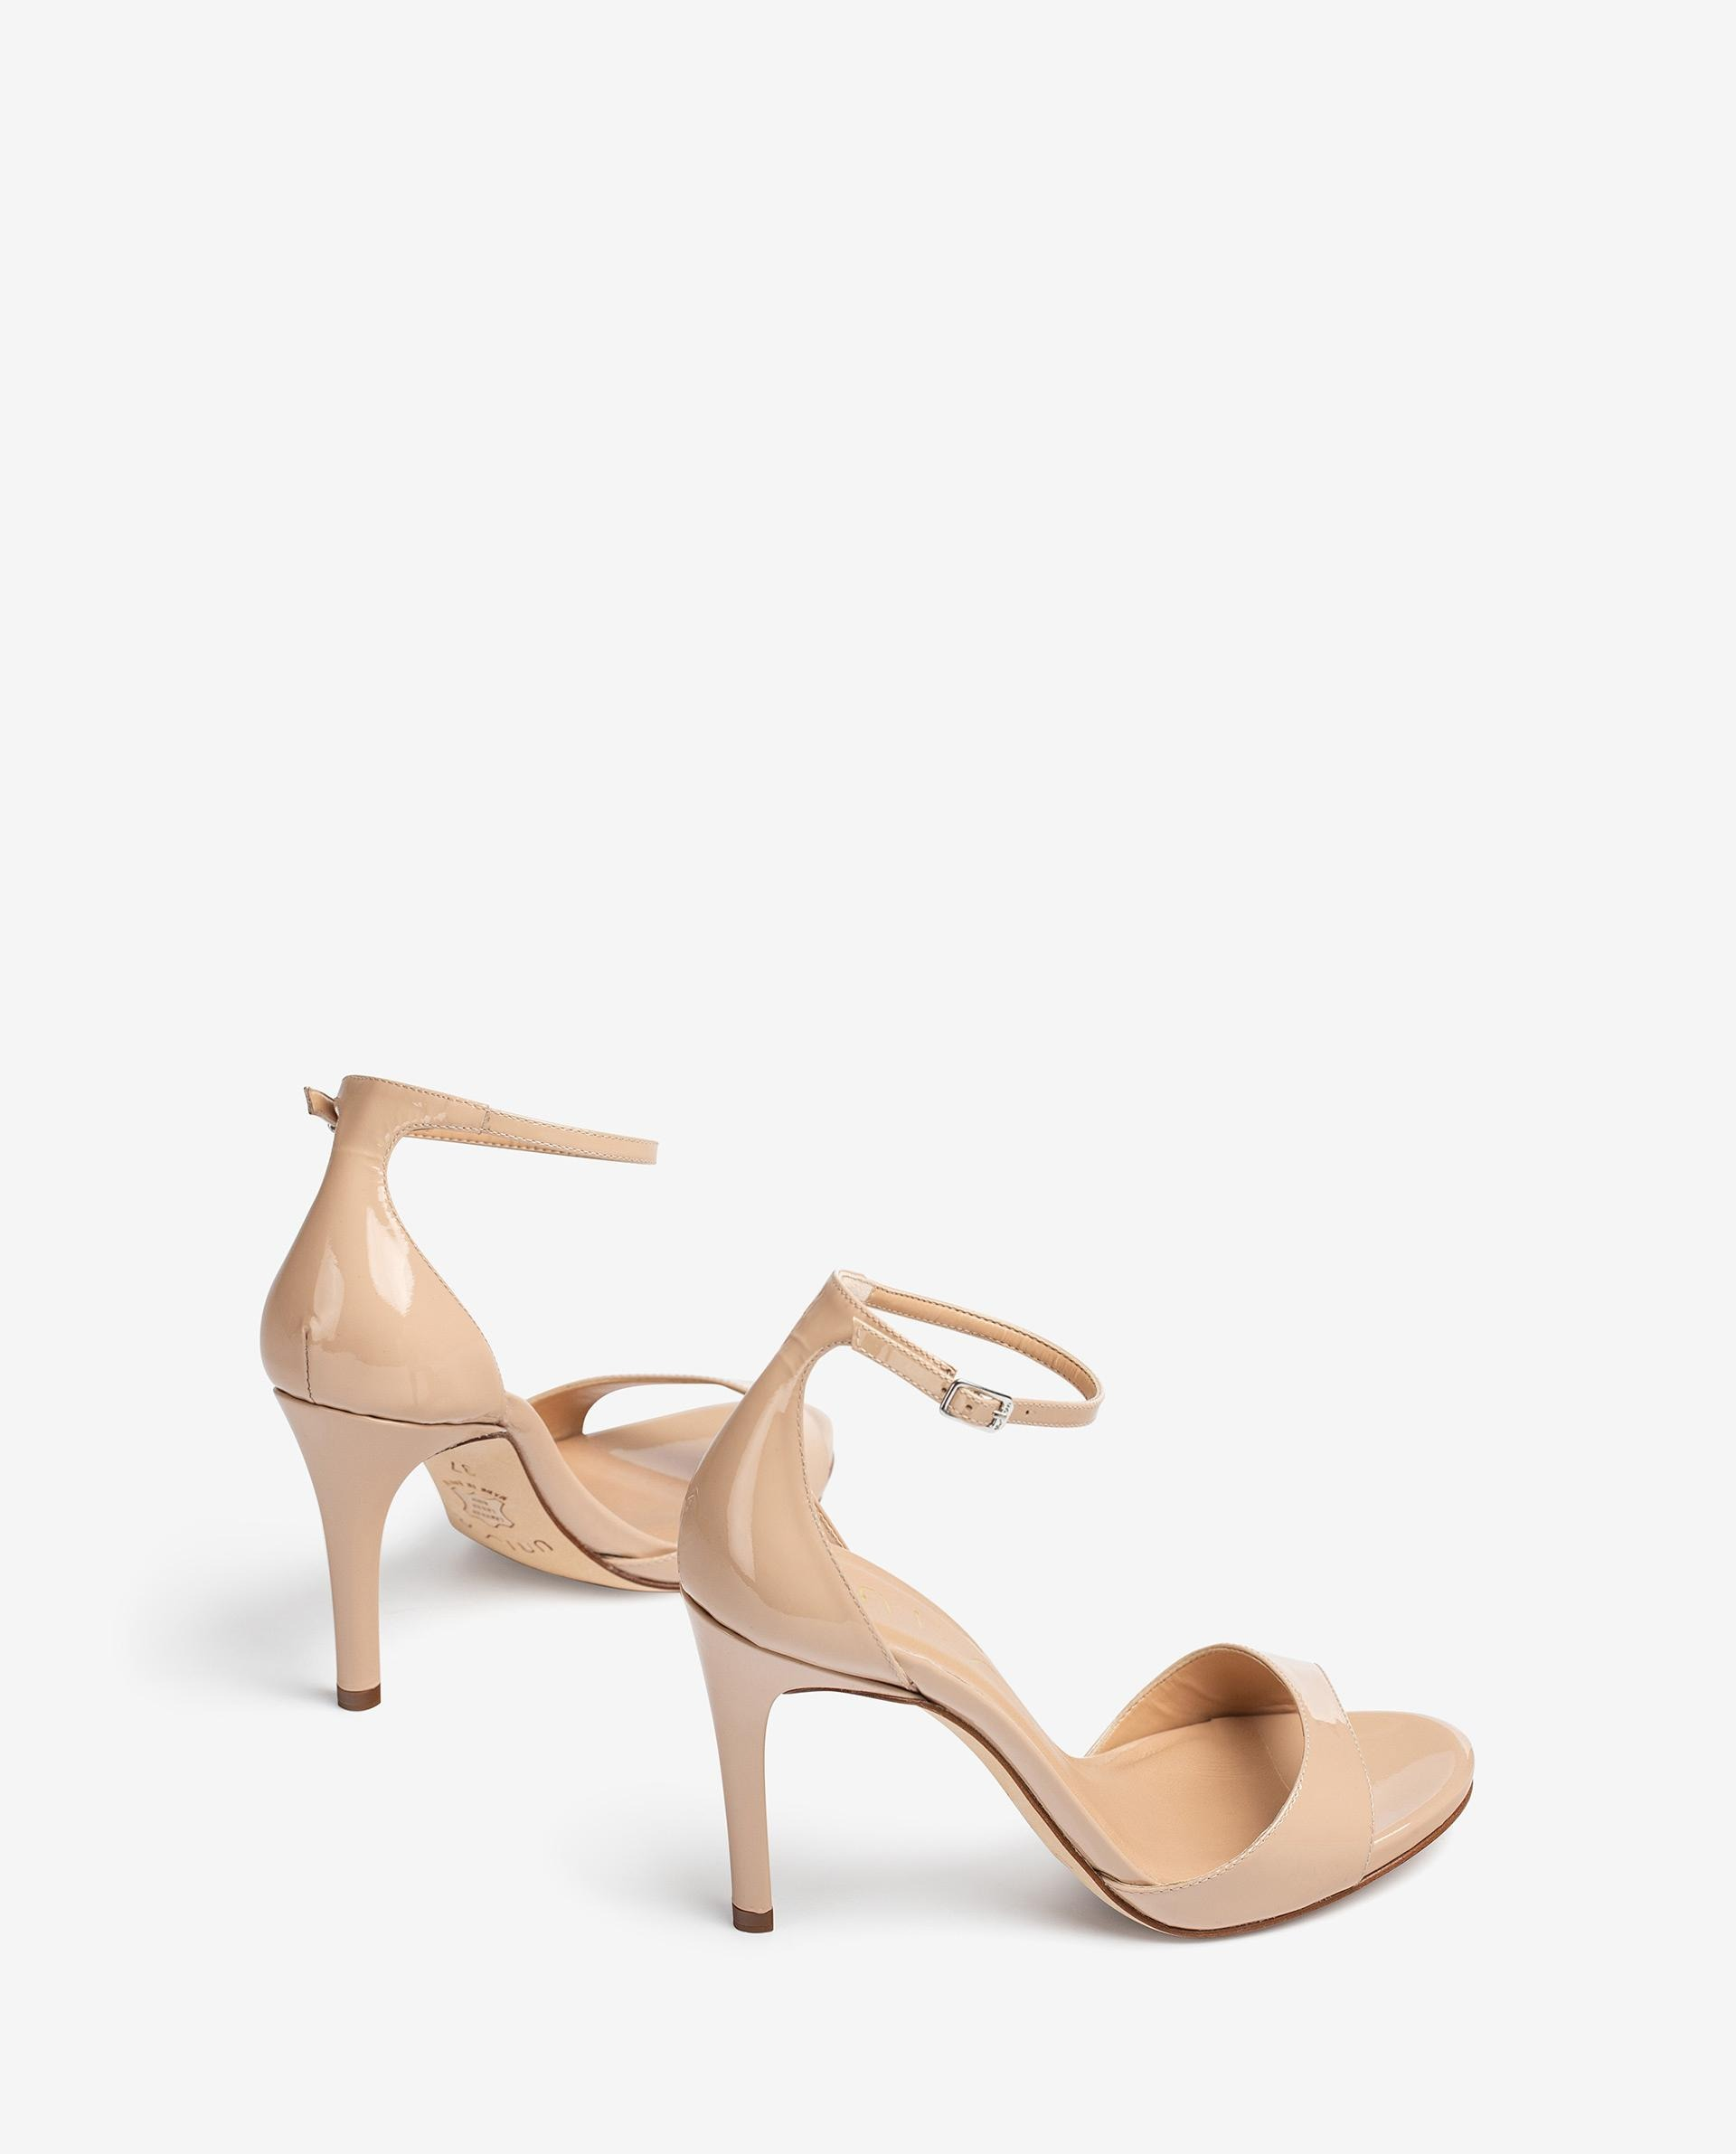 UNISA Patent leather high heel sandals YAGUE_PA 2